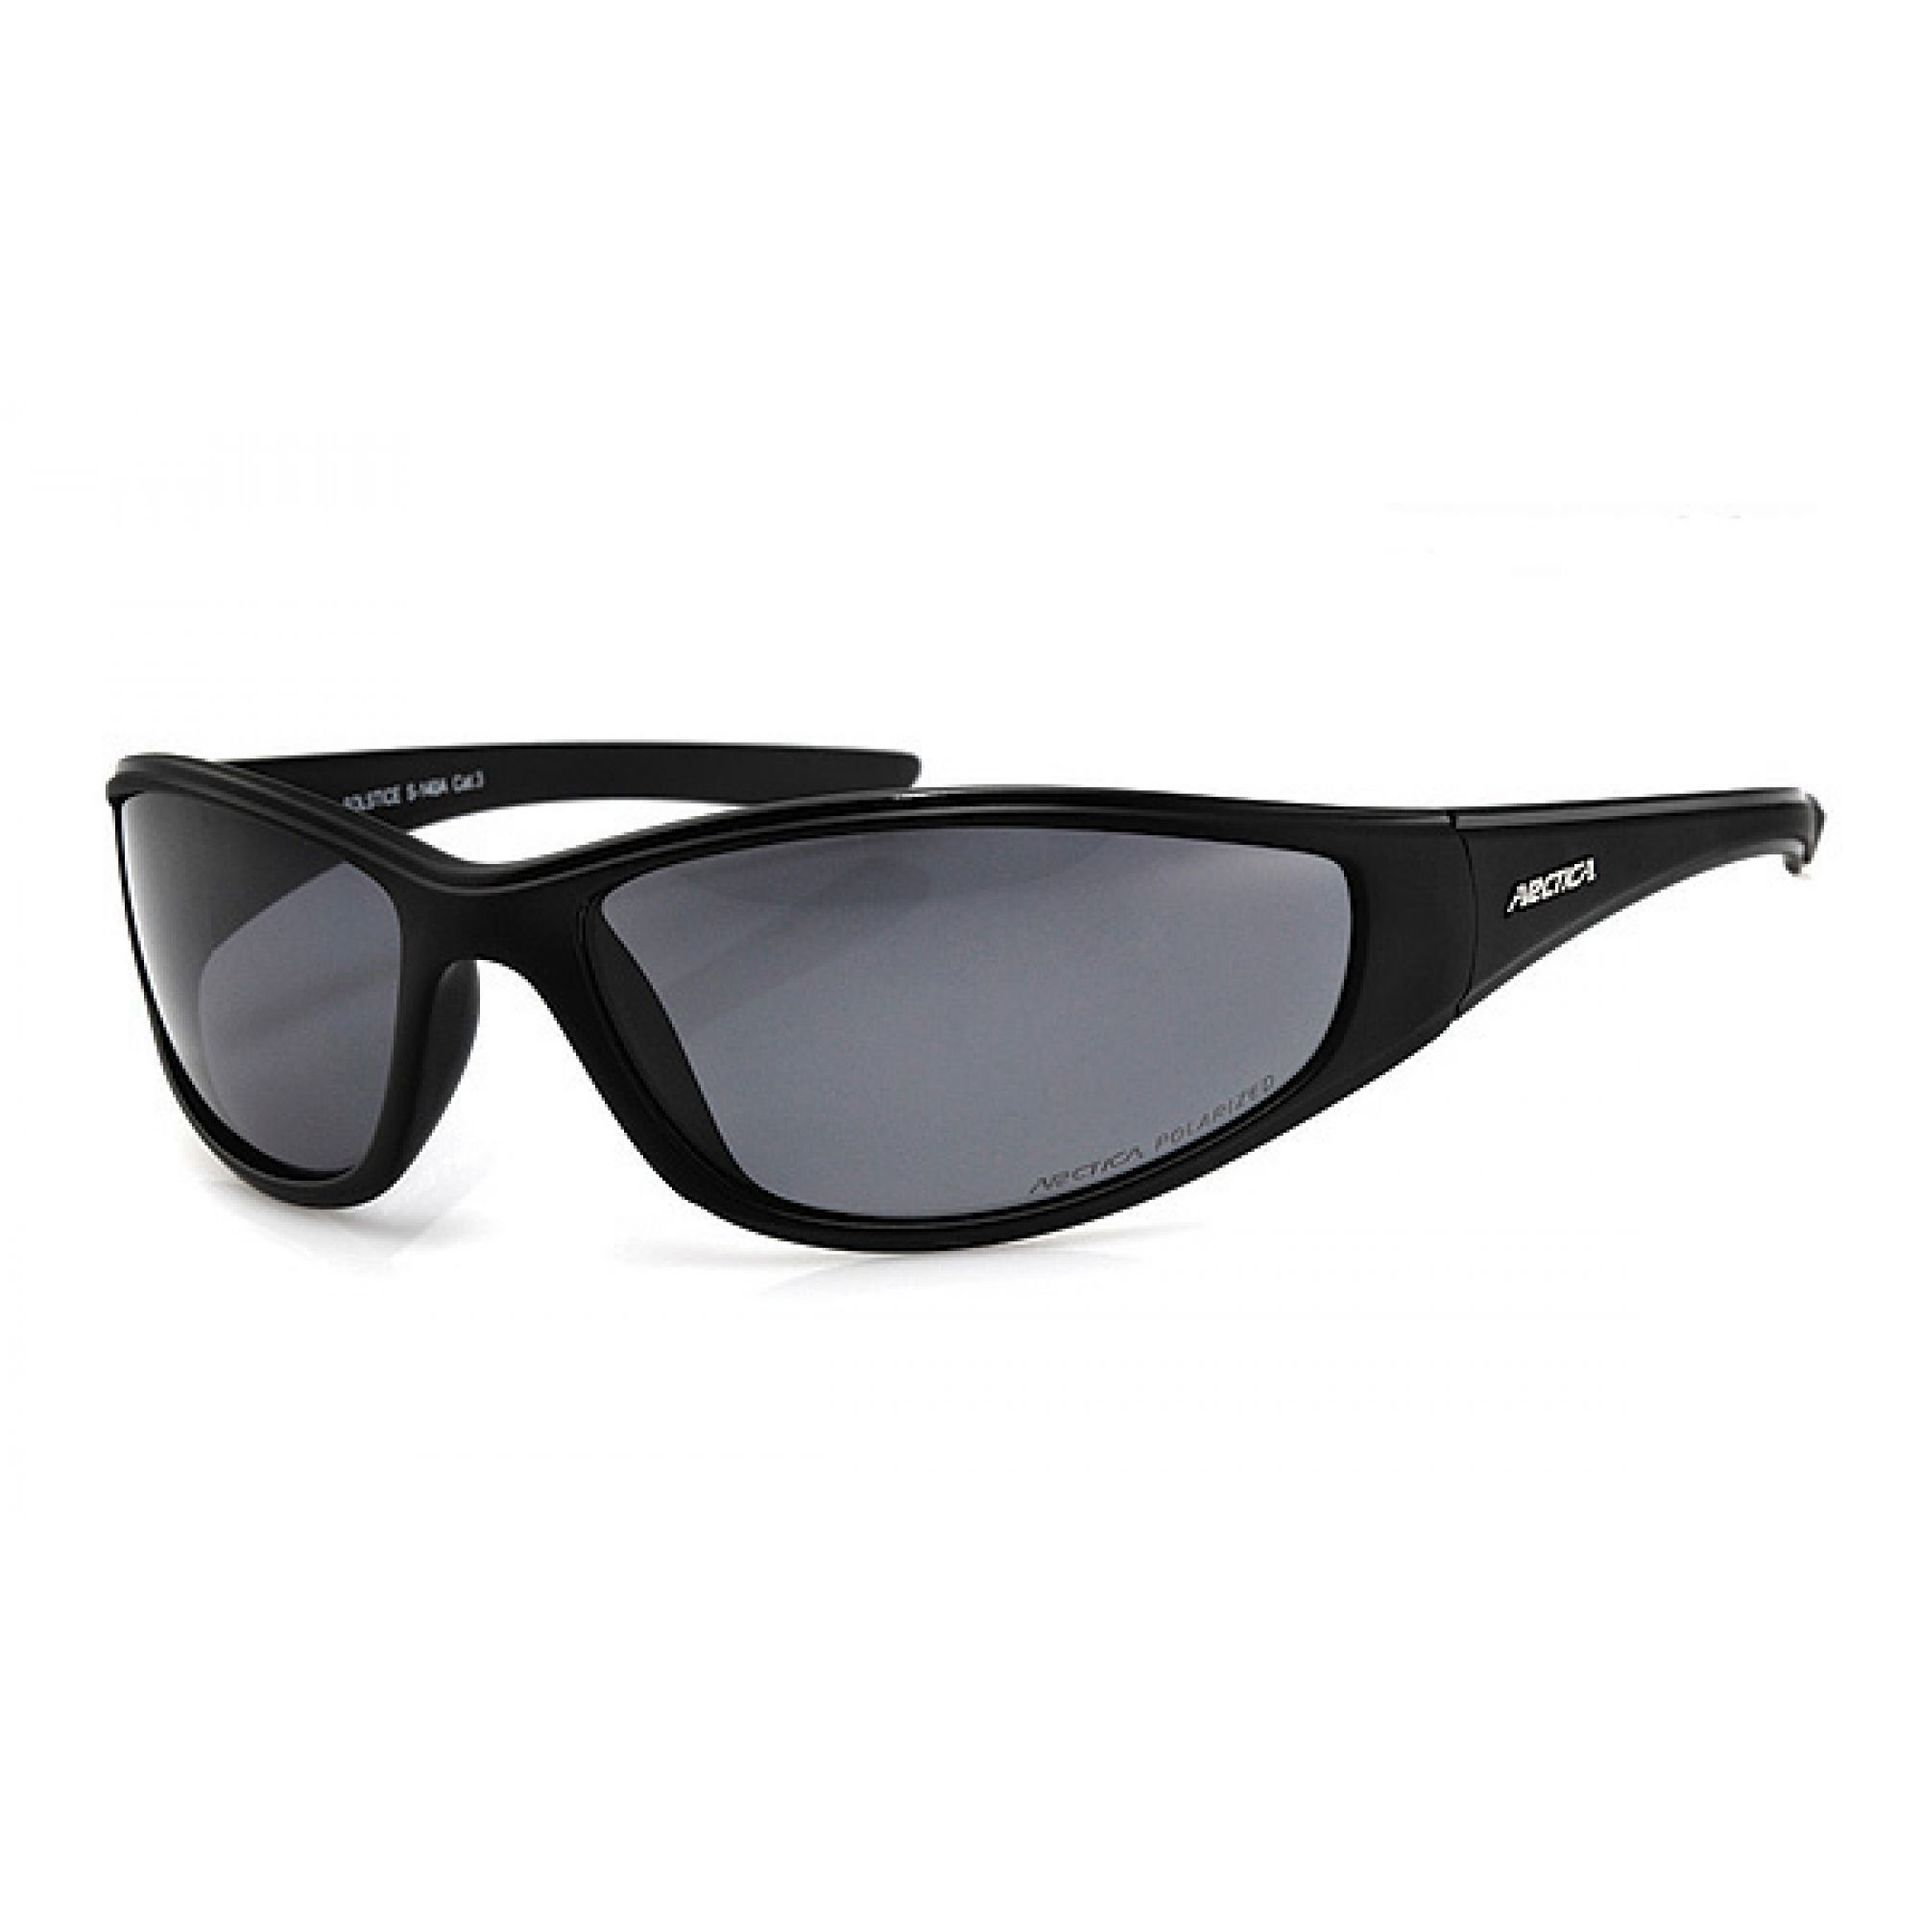 Okulary Arctica S-140 czarne